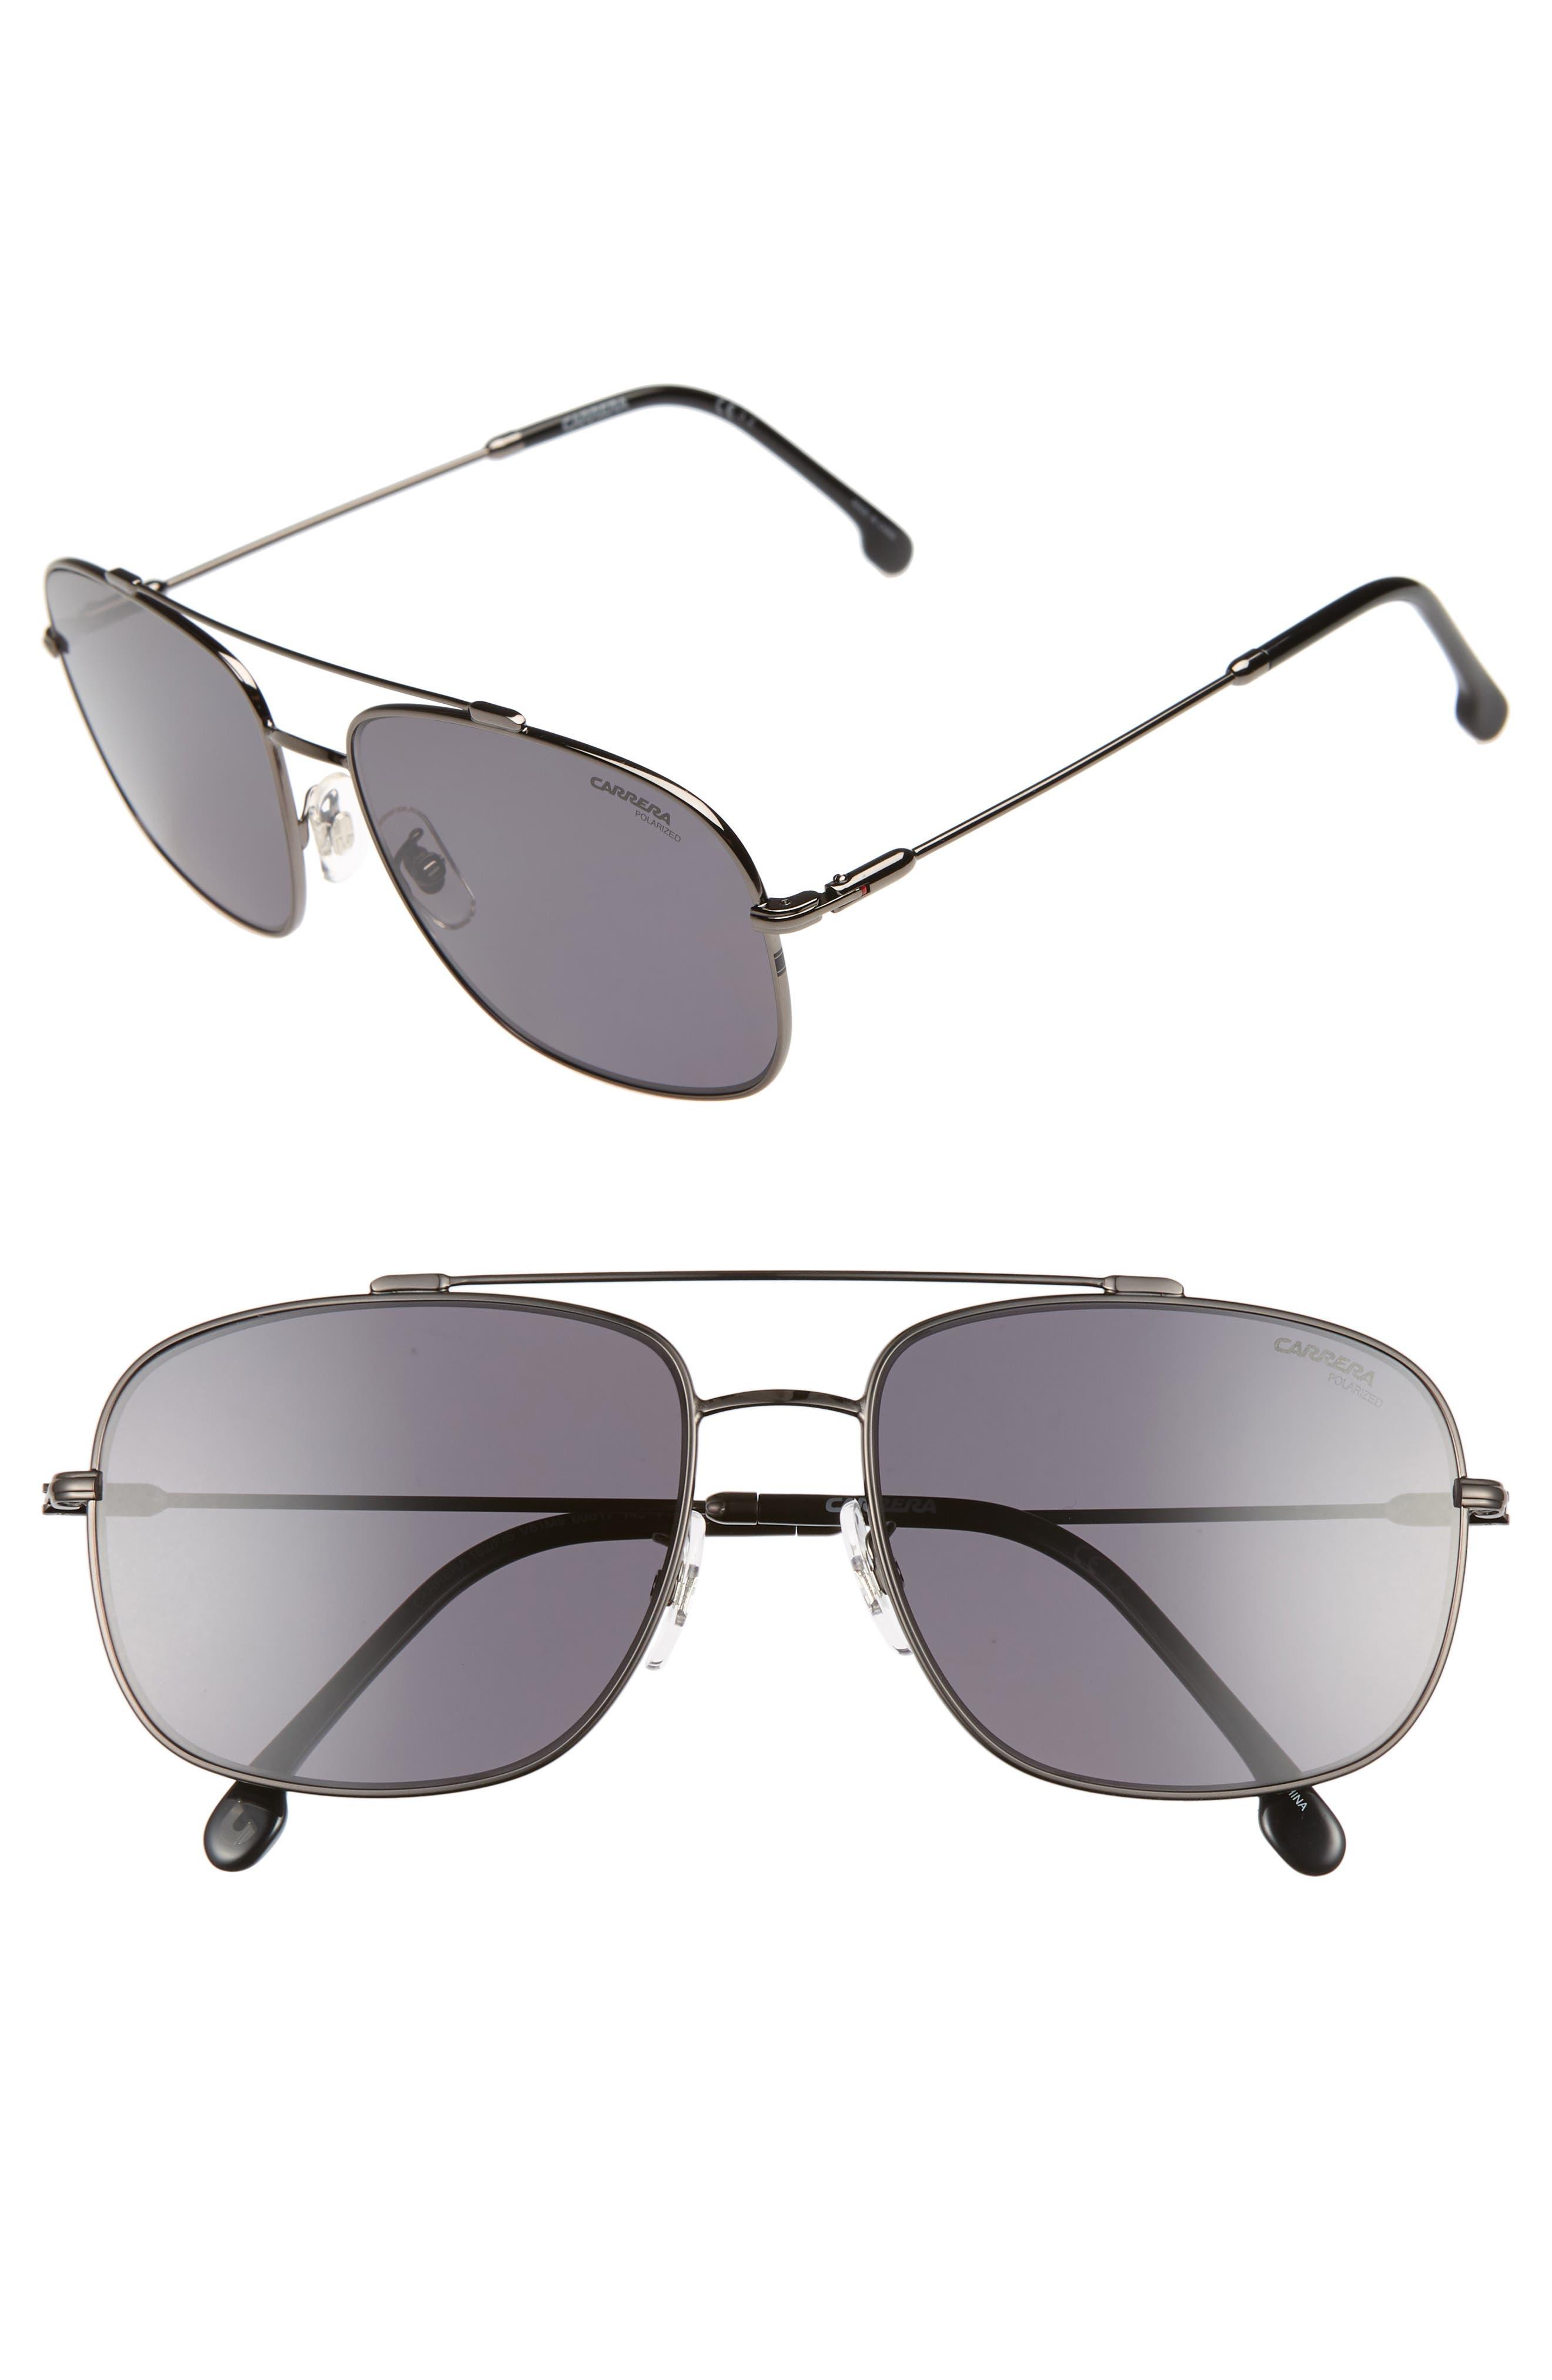 60mm Special Fit Polarized Navigator Sunglasses,                         Main,                         color, DARK RUTHENIUM/ BLACK